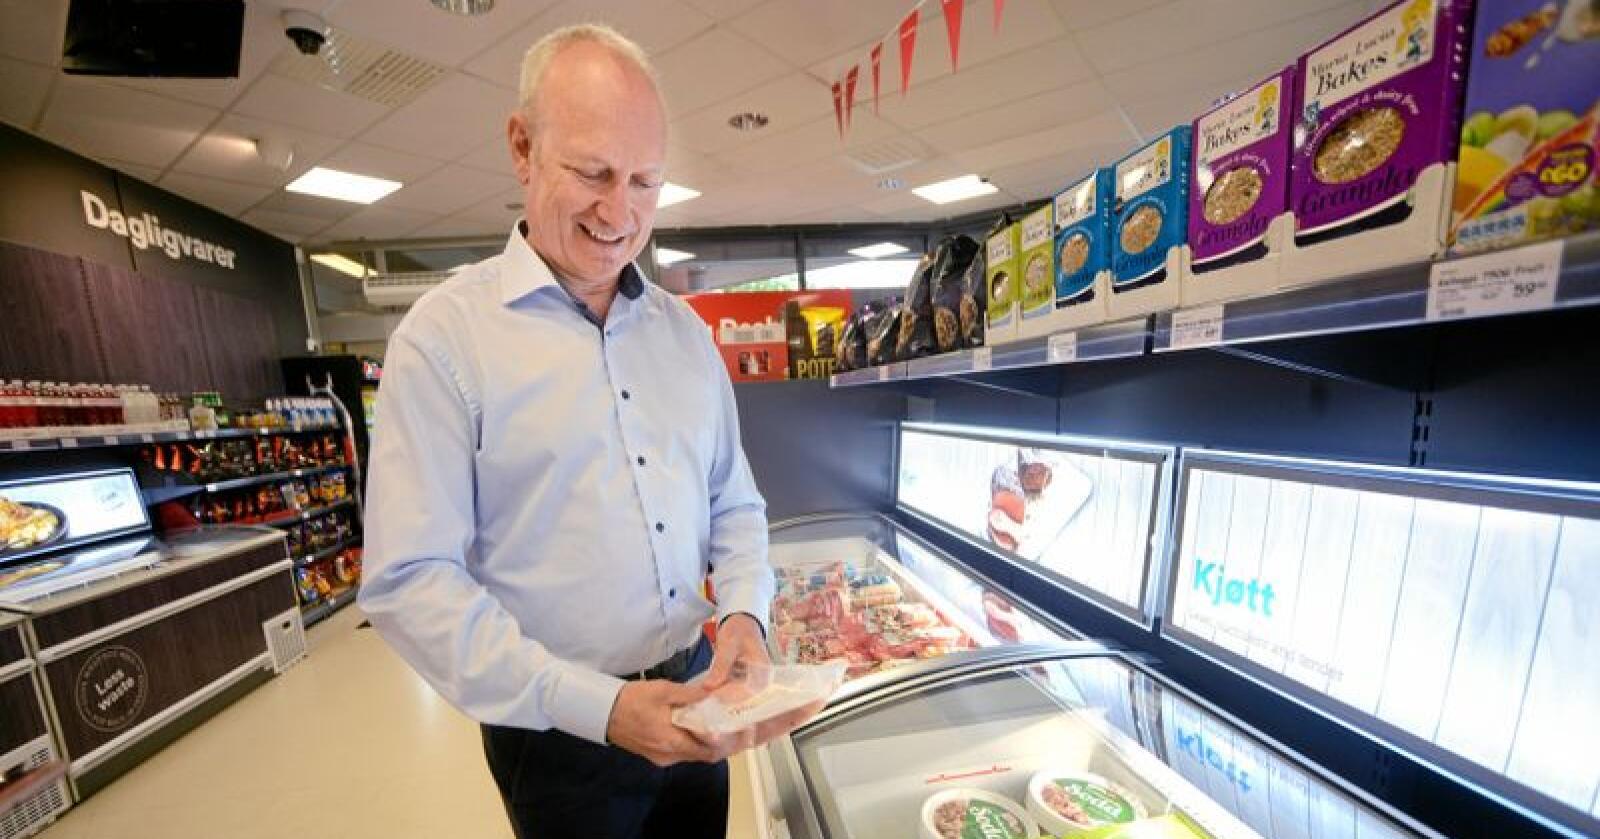 Geir Olav Opheim er sjef for den britiske dagligvarekjeden Iceland Foods i Norge. Foto: Siri Juell Rasmussen